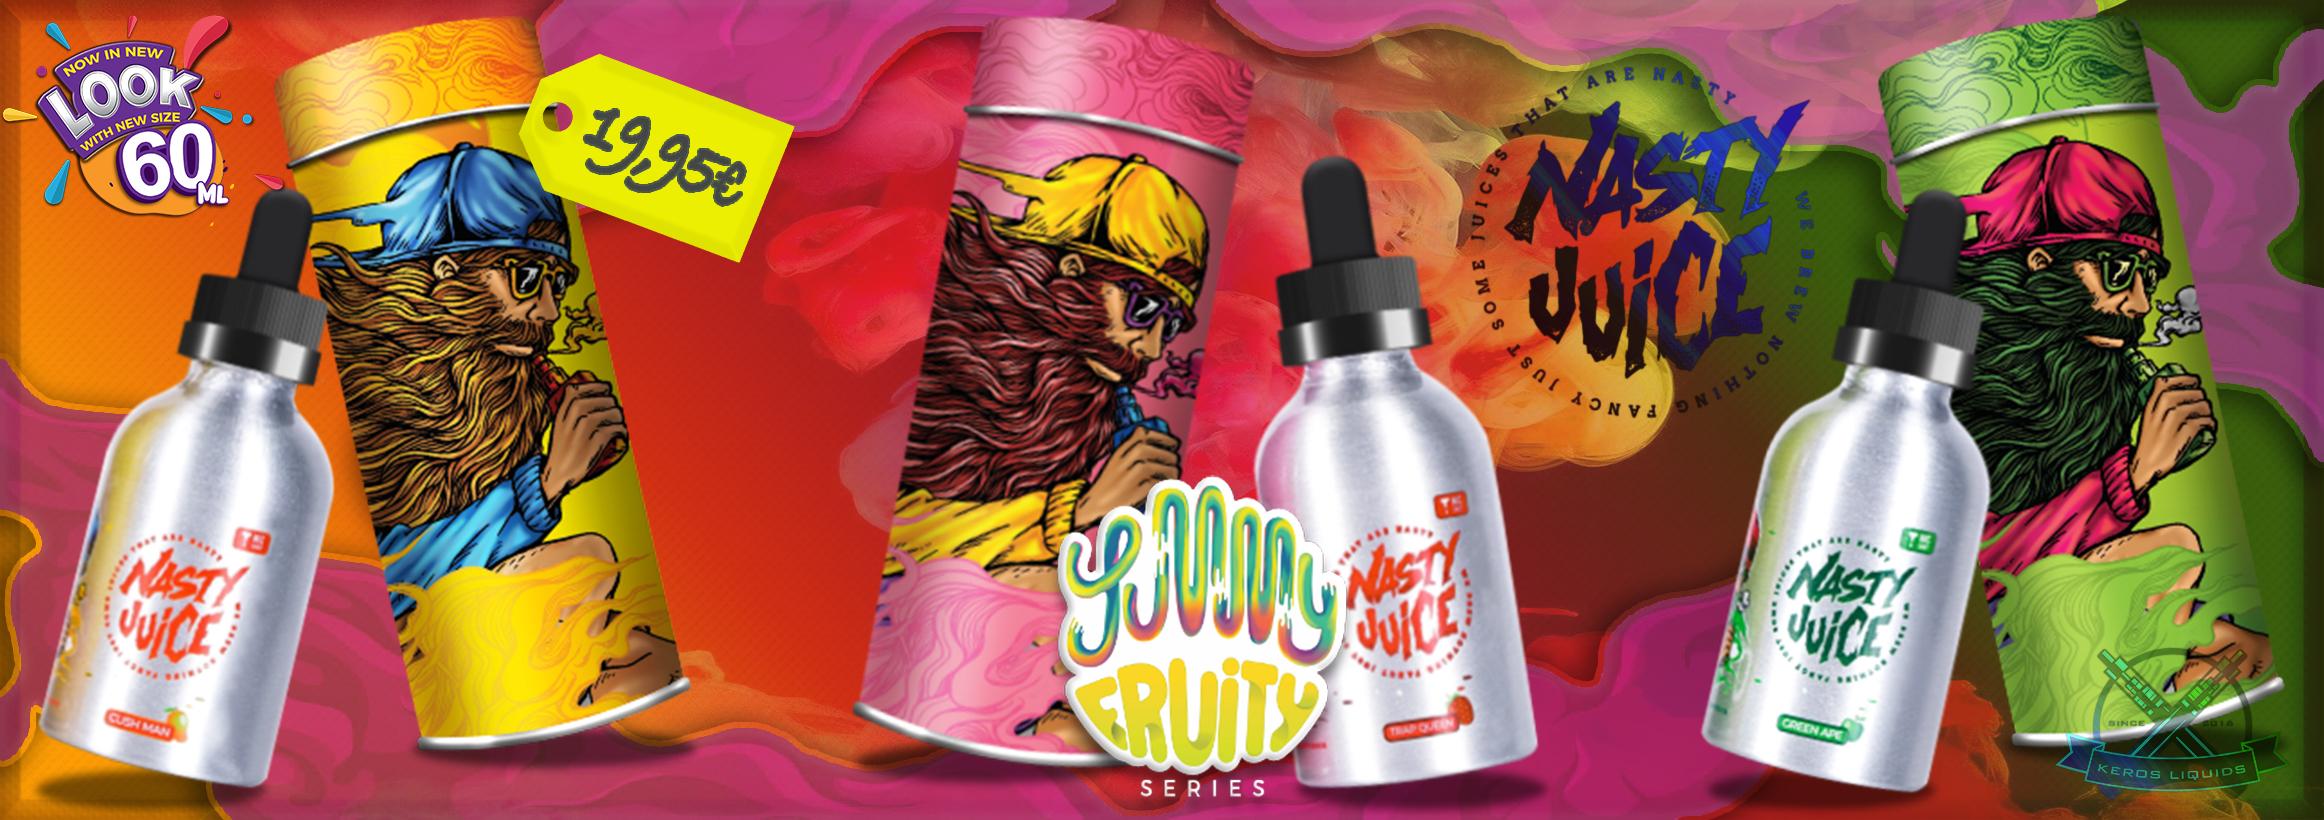 KerosLiquids-Nasty-Juice-Banner-Yummy-Fruity5a5908c73550a